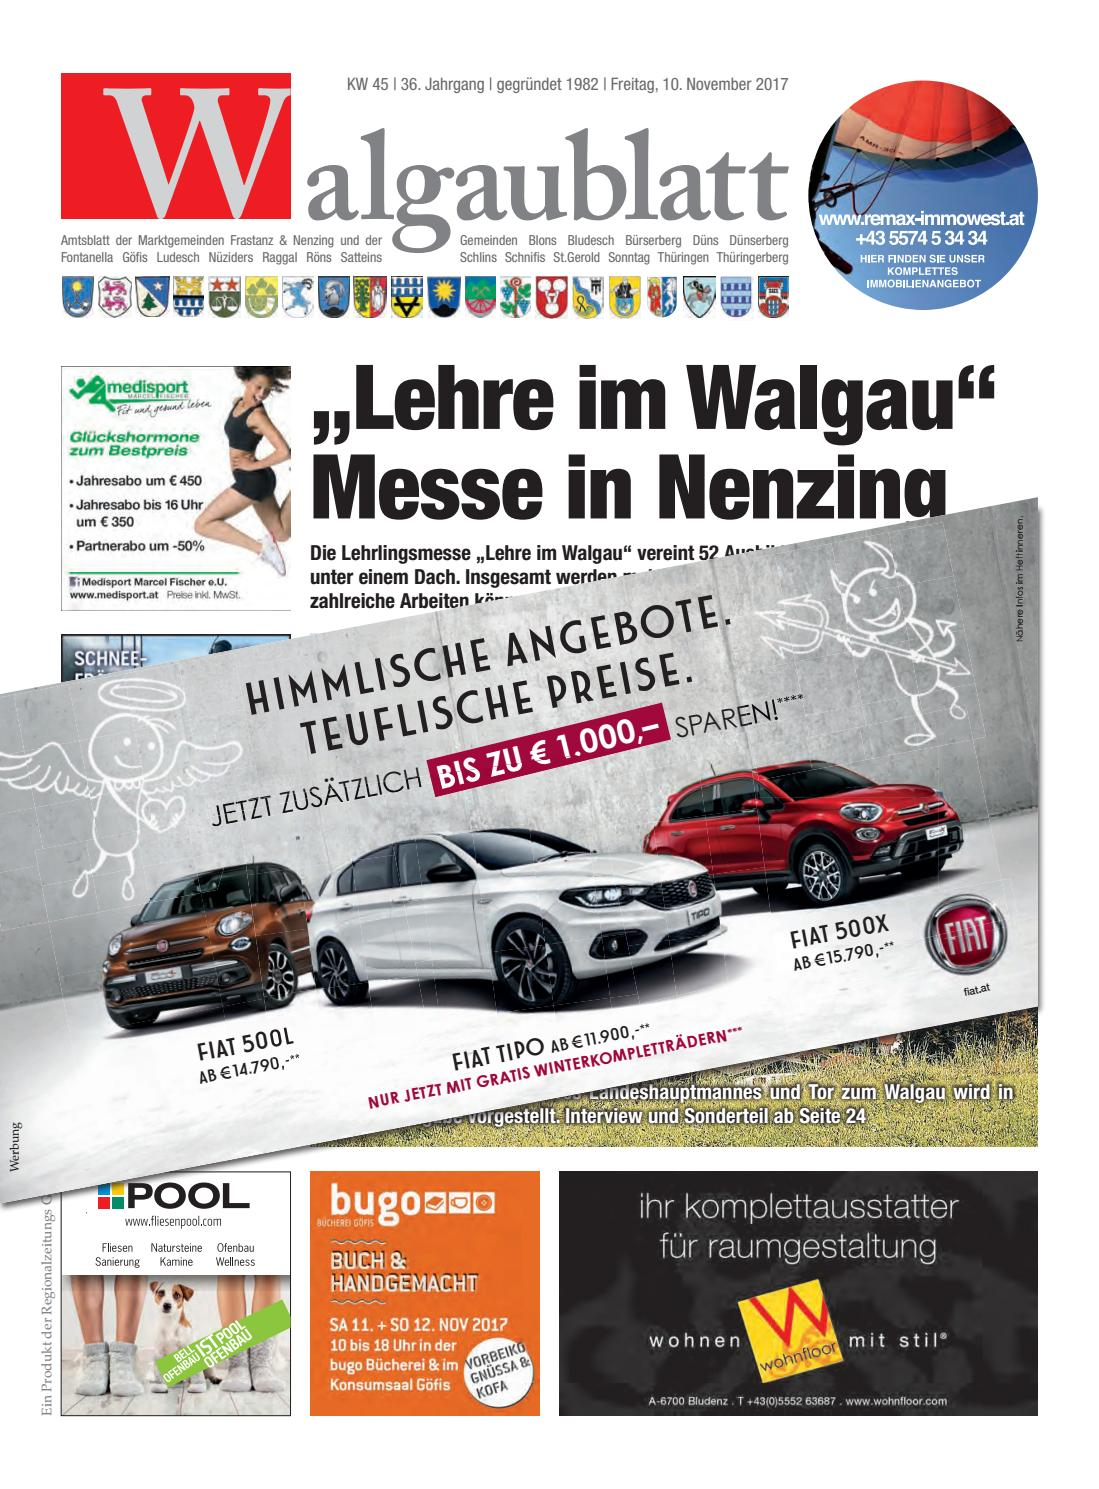 Walgaublatt%2045 by Regionalzeitungs GmbH - issuu